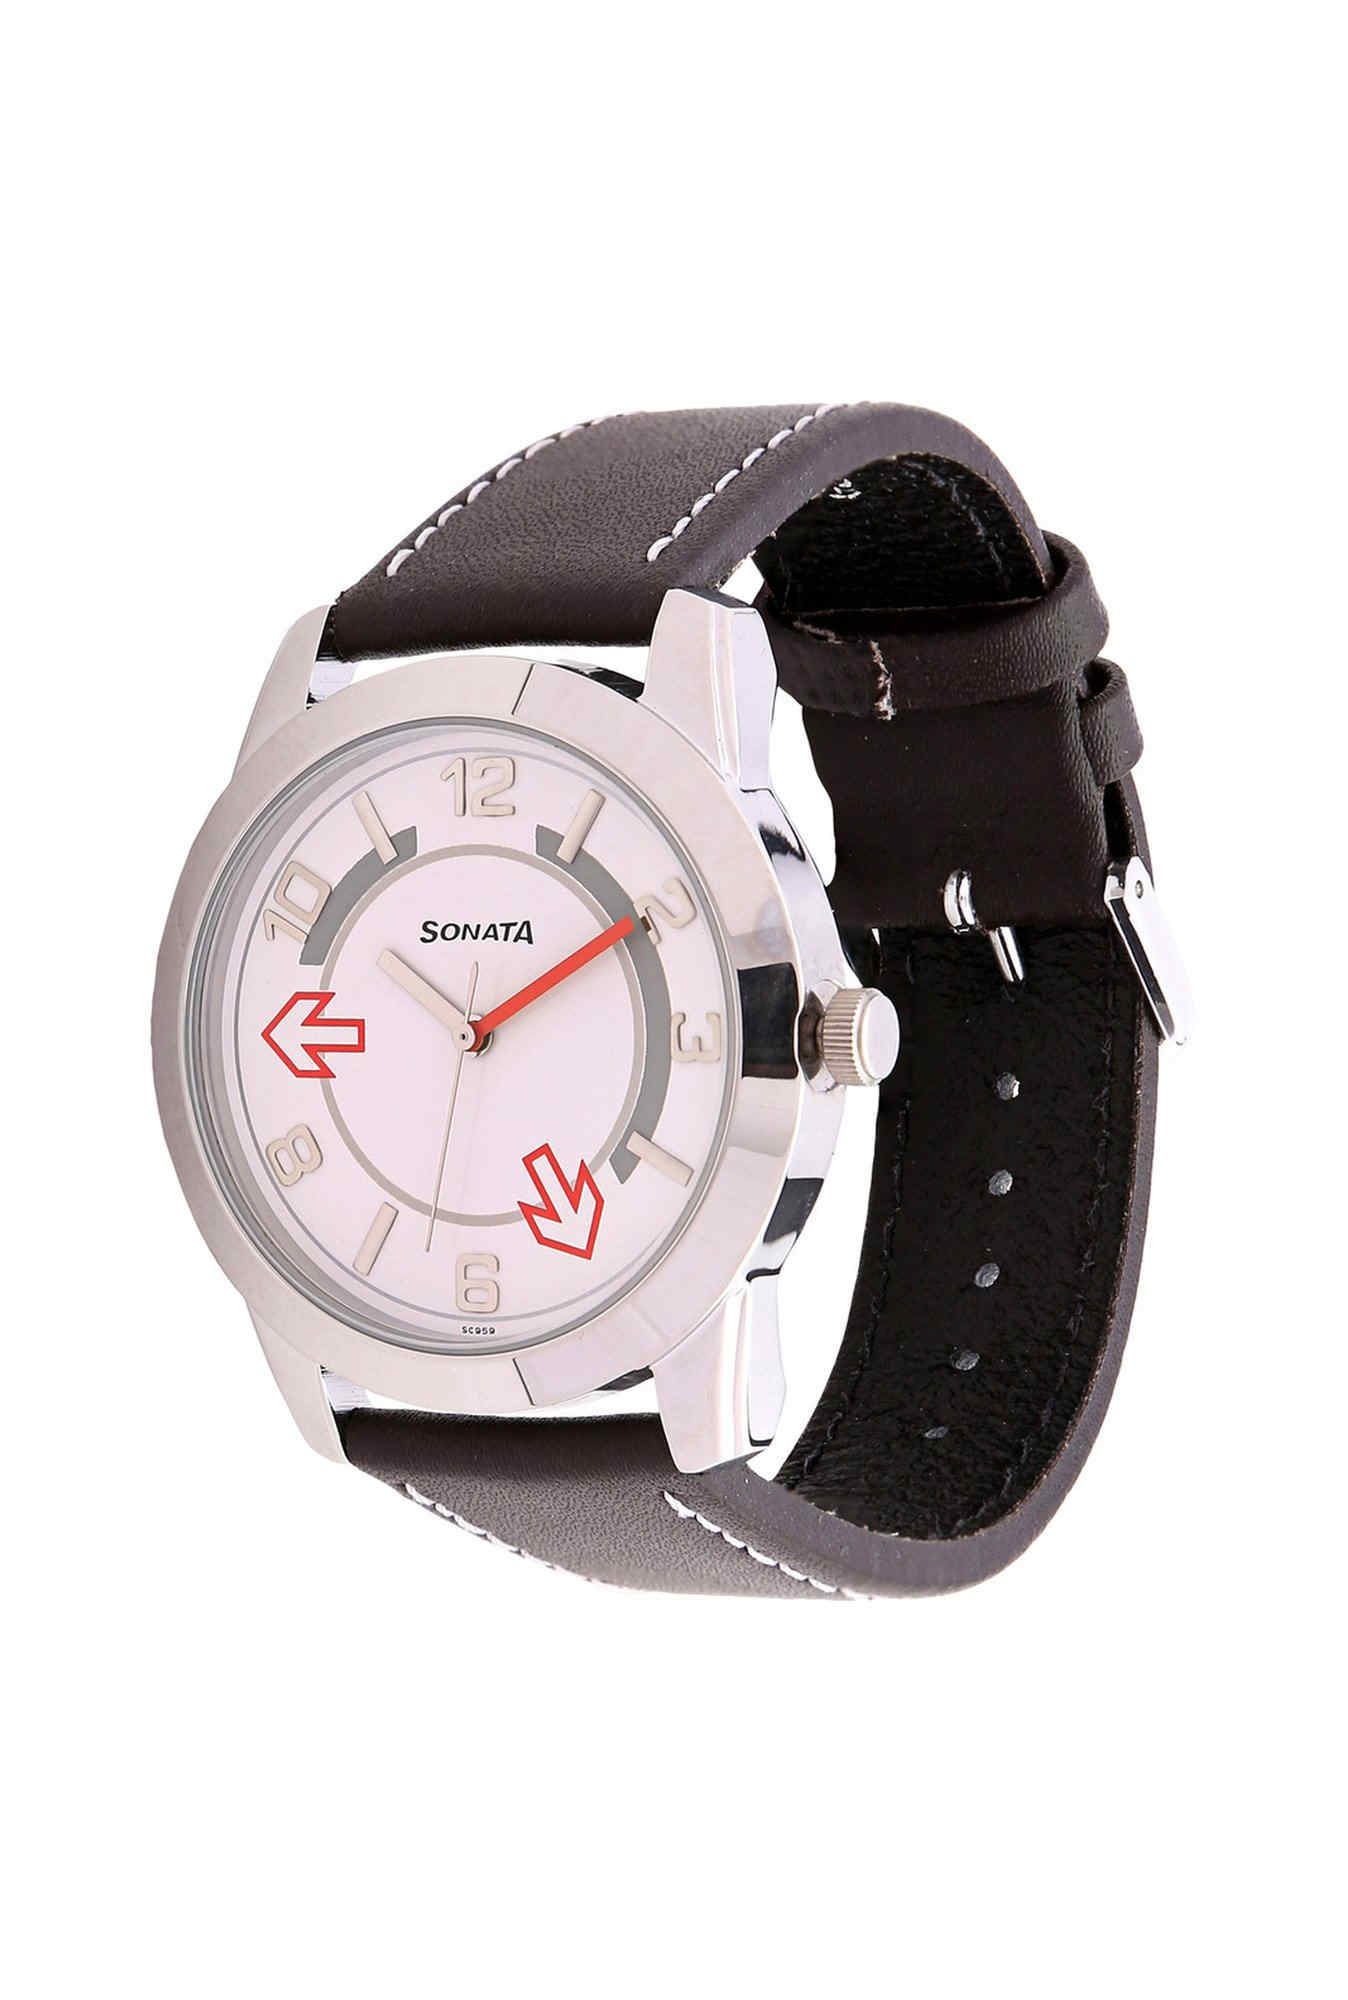 Sonata NH7924SL03C Yuva Analog White Dial Men's Watch (NH7924SL03C)